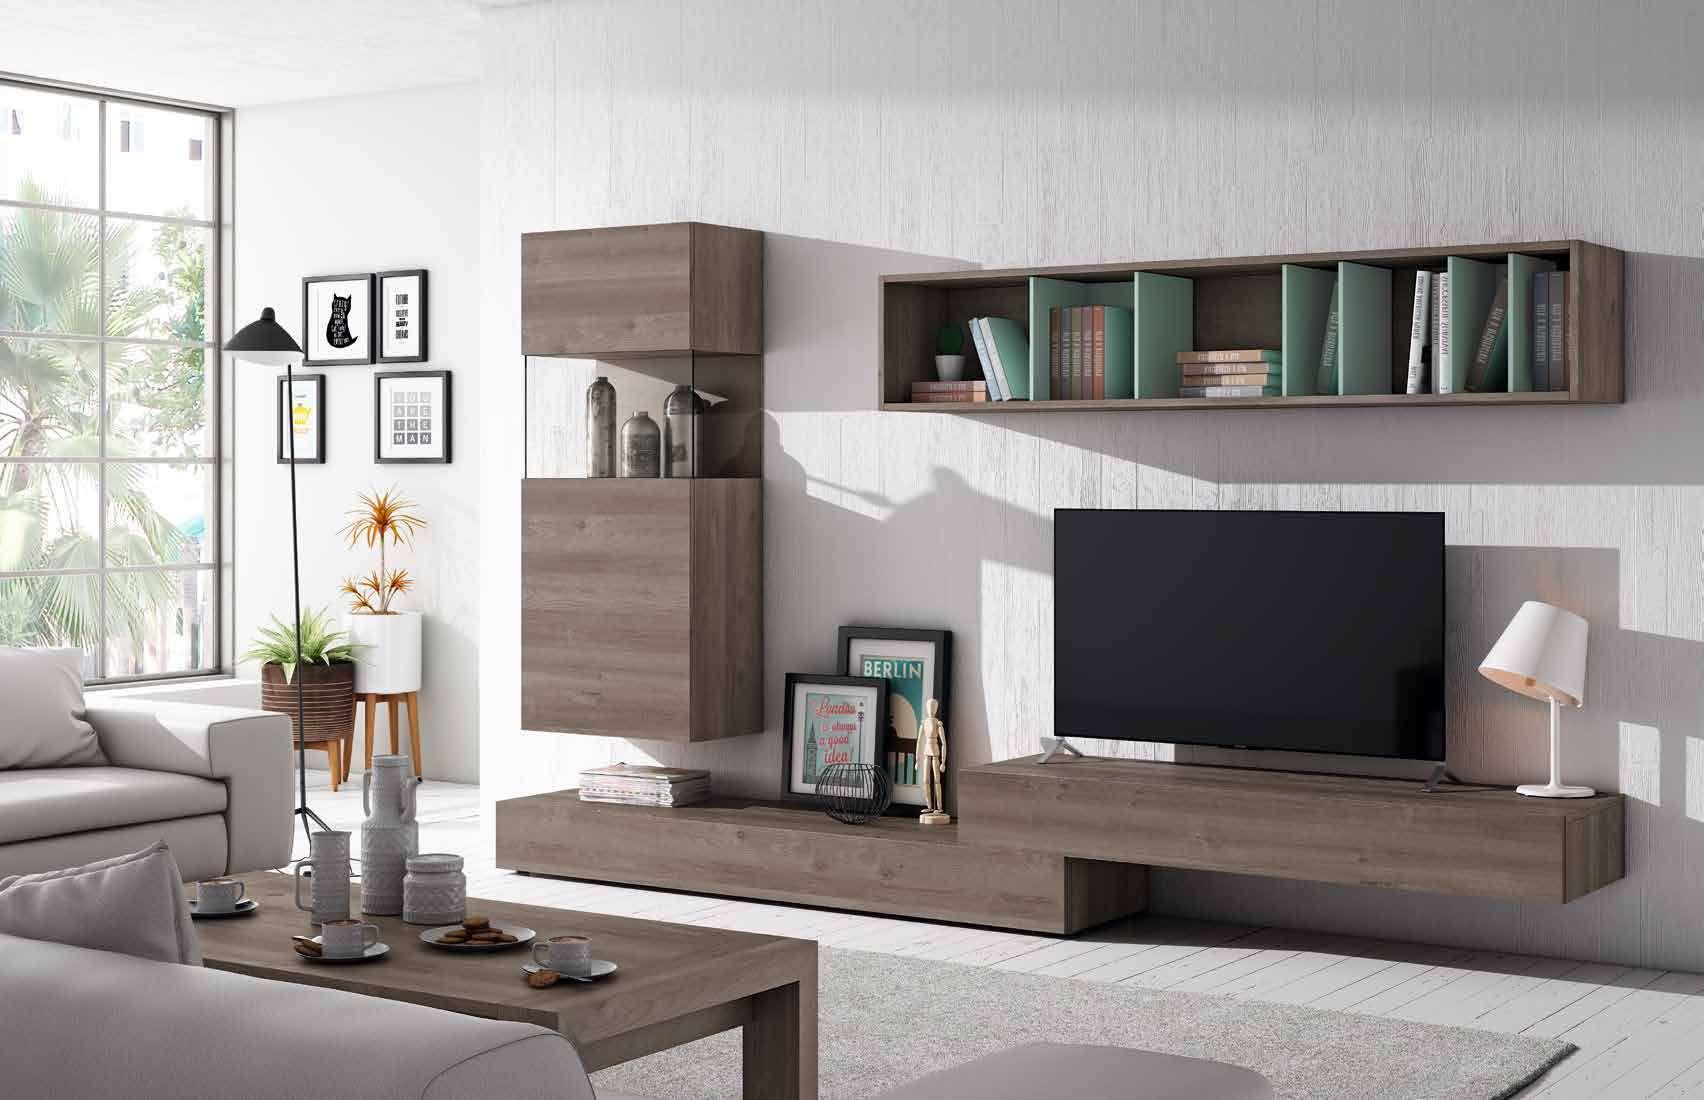 muebles pedro alcaraz obtenga ideas dise o de muebles